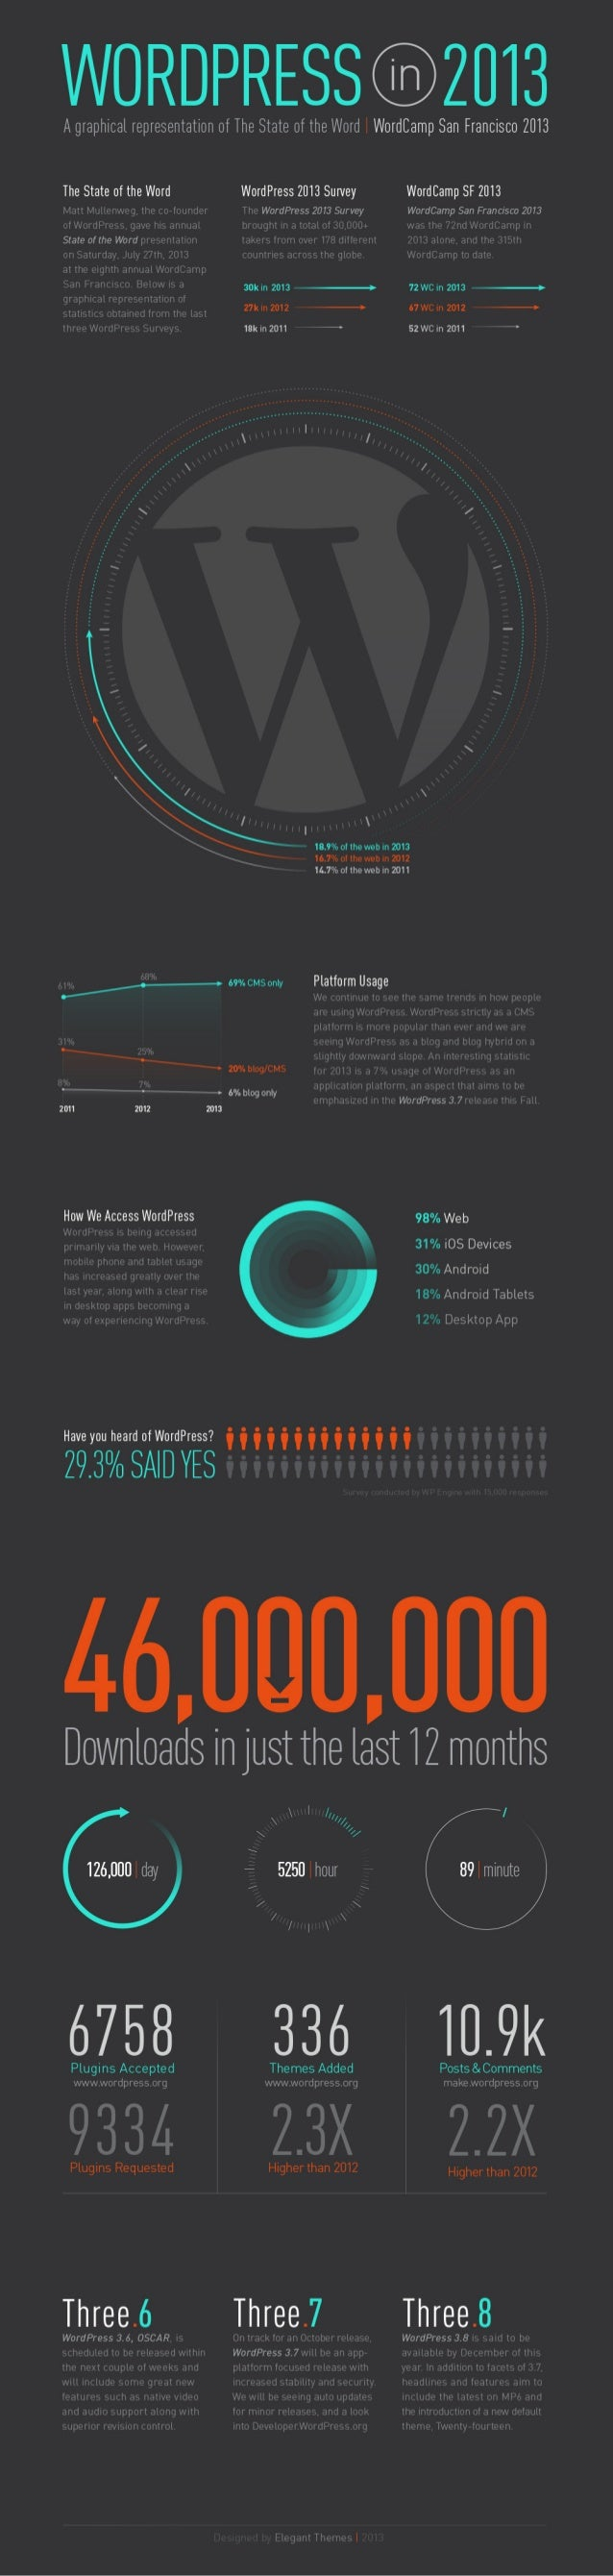 A Visual Representation of  Wordpress infographic 2013